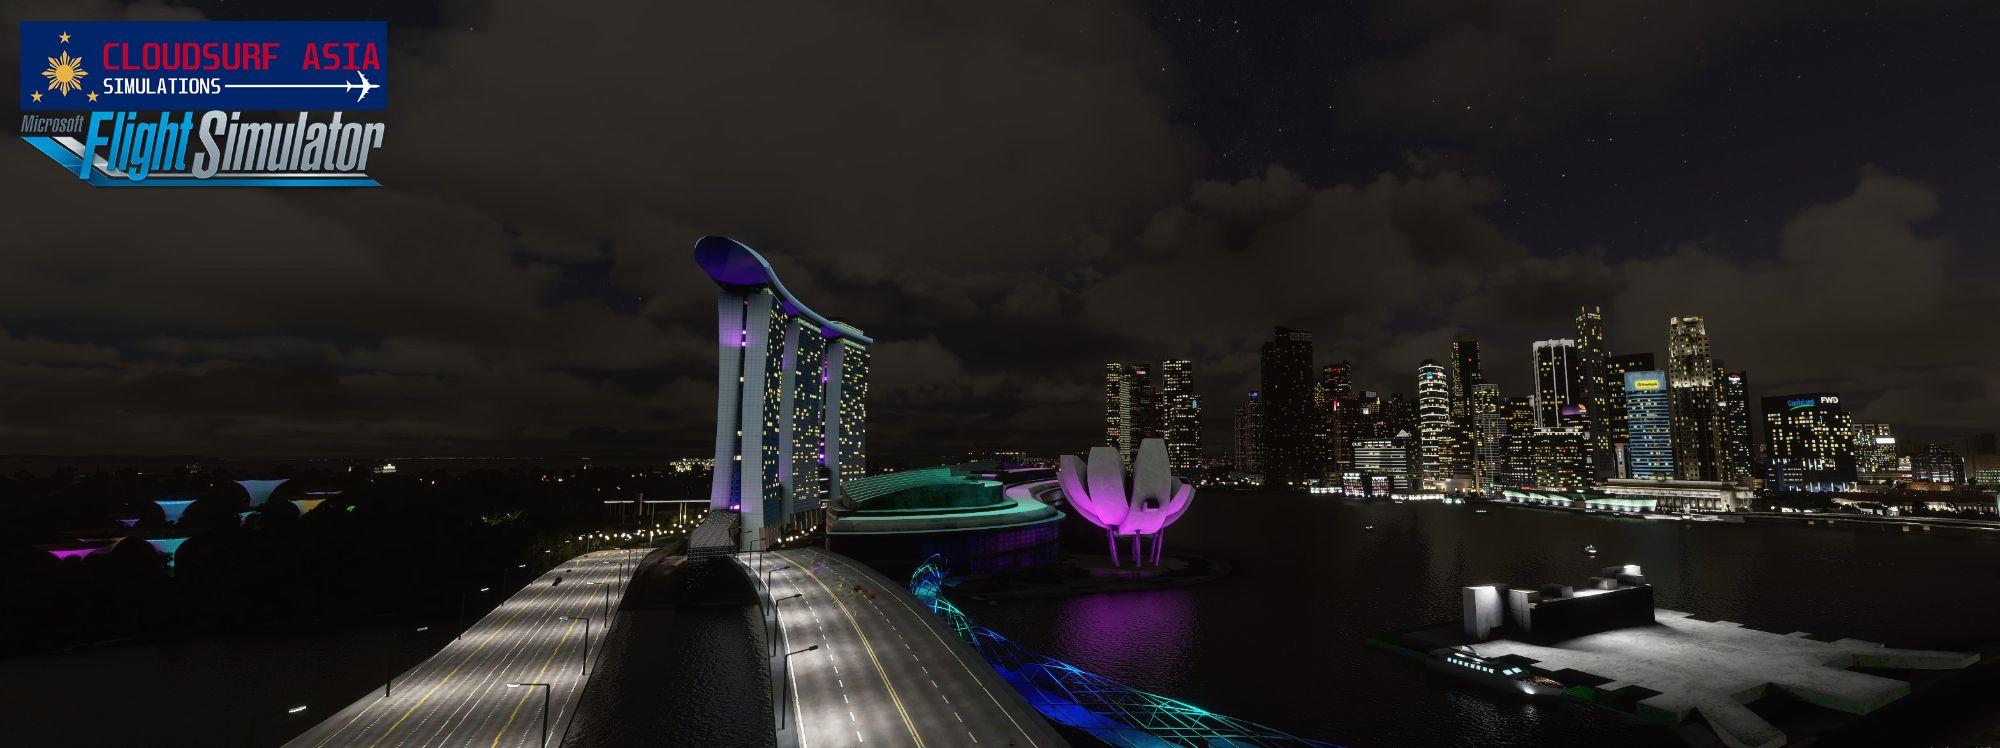 SINGAPOREDT6.jpg